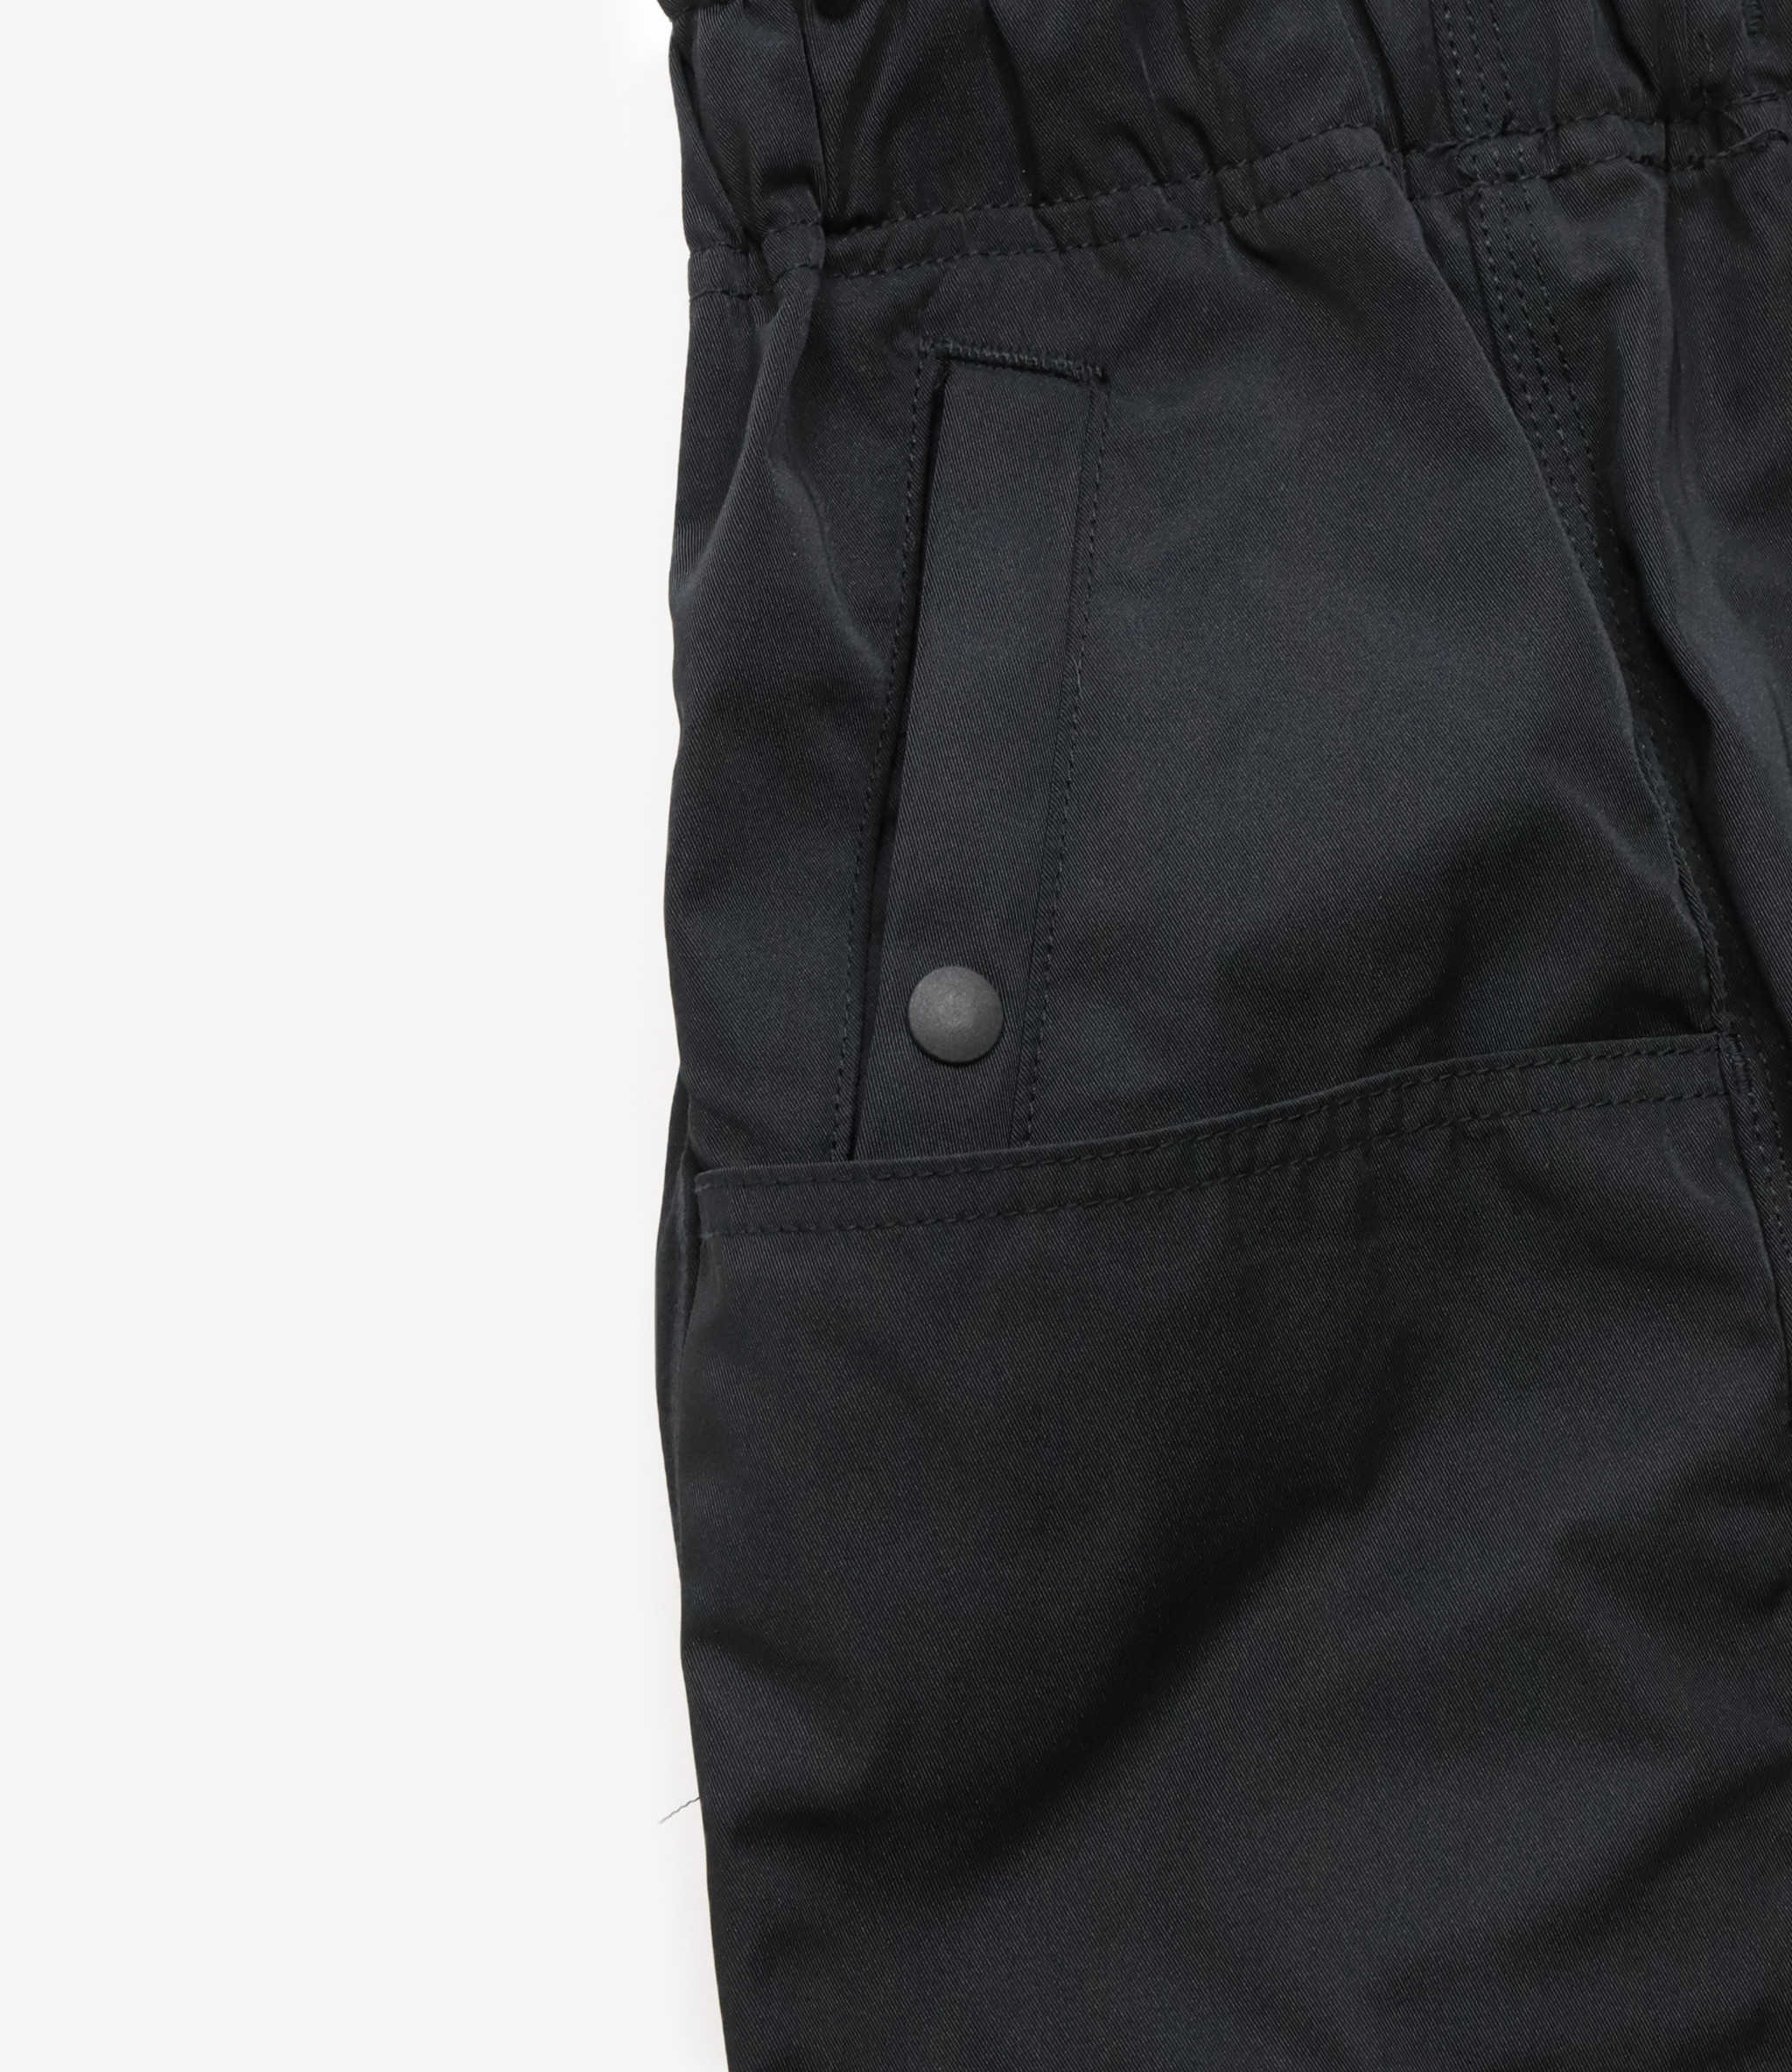 South2 West8 Belted Center Seam Pant Poly Gabardine - Black